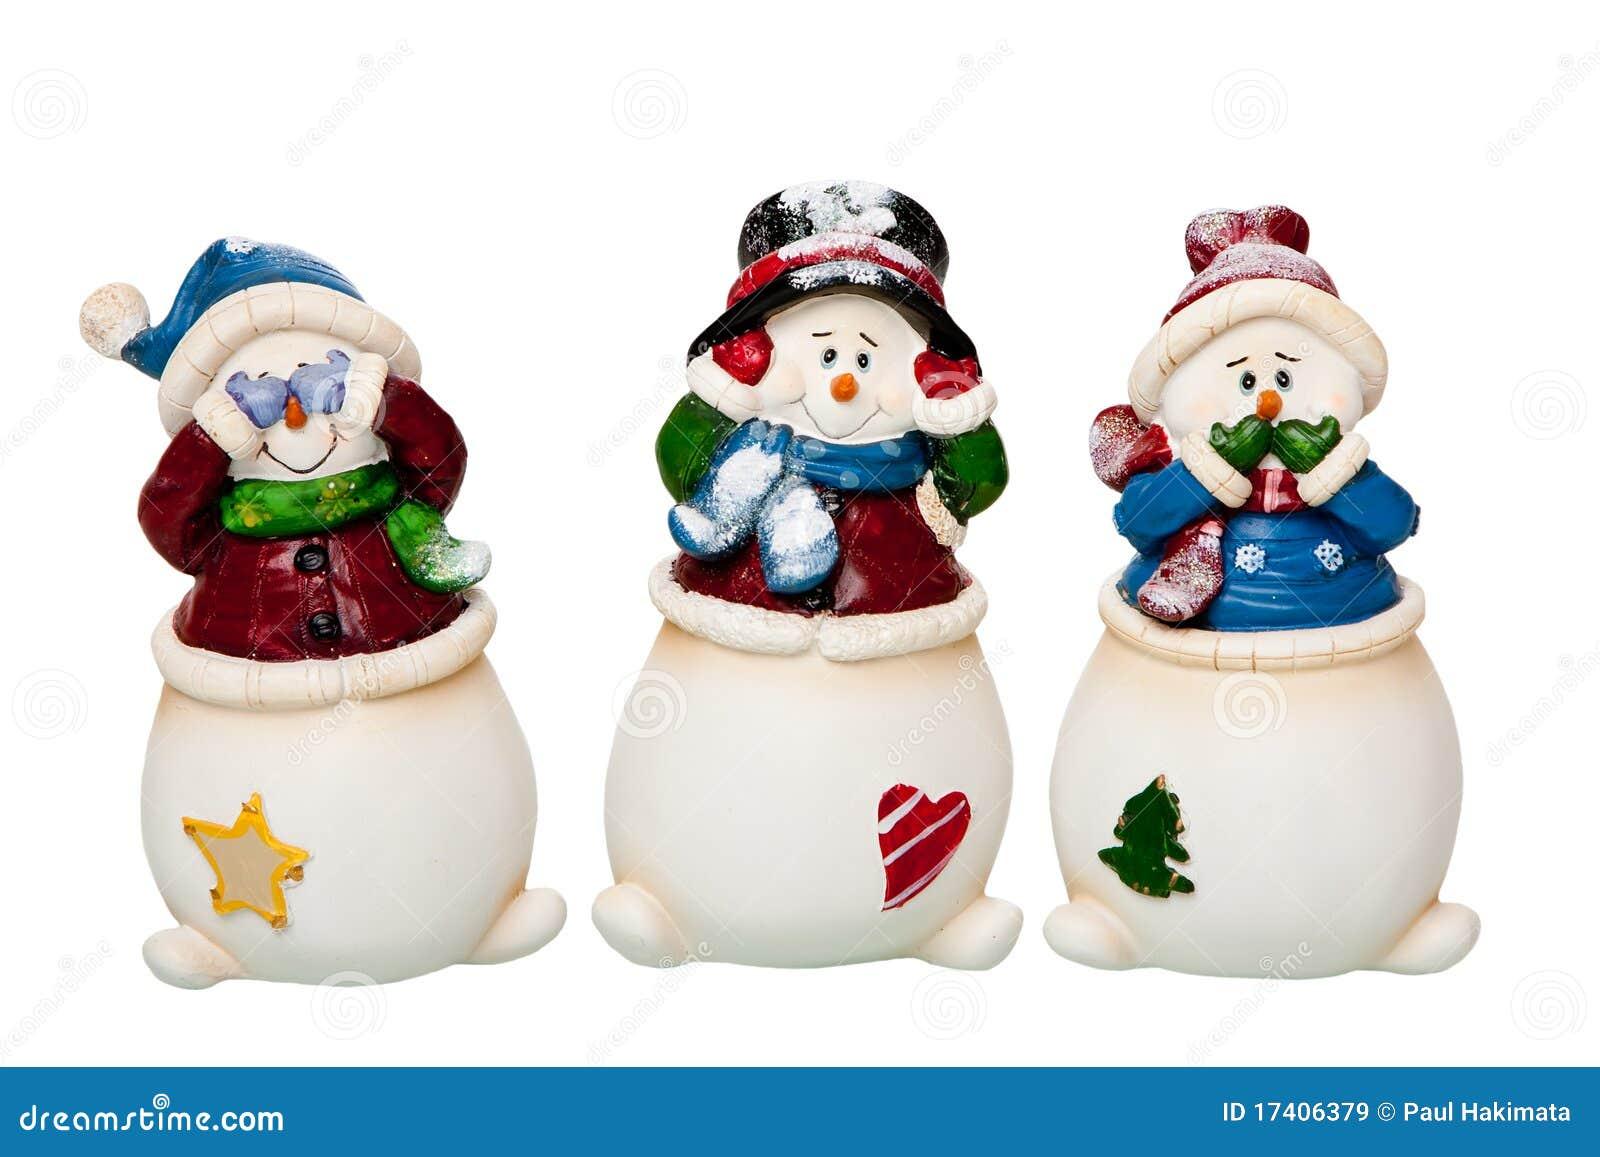 See, Hear, Speak No Evil Snowman Stock Image - Image of three, xmas ...